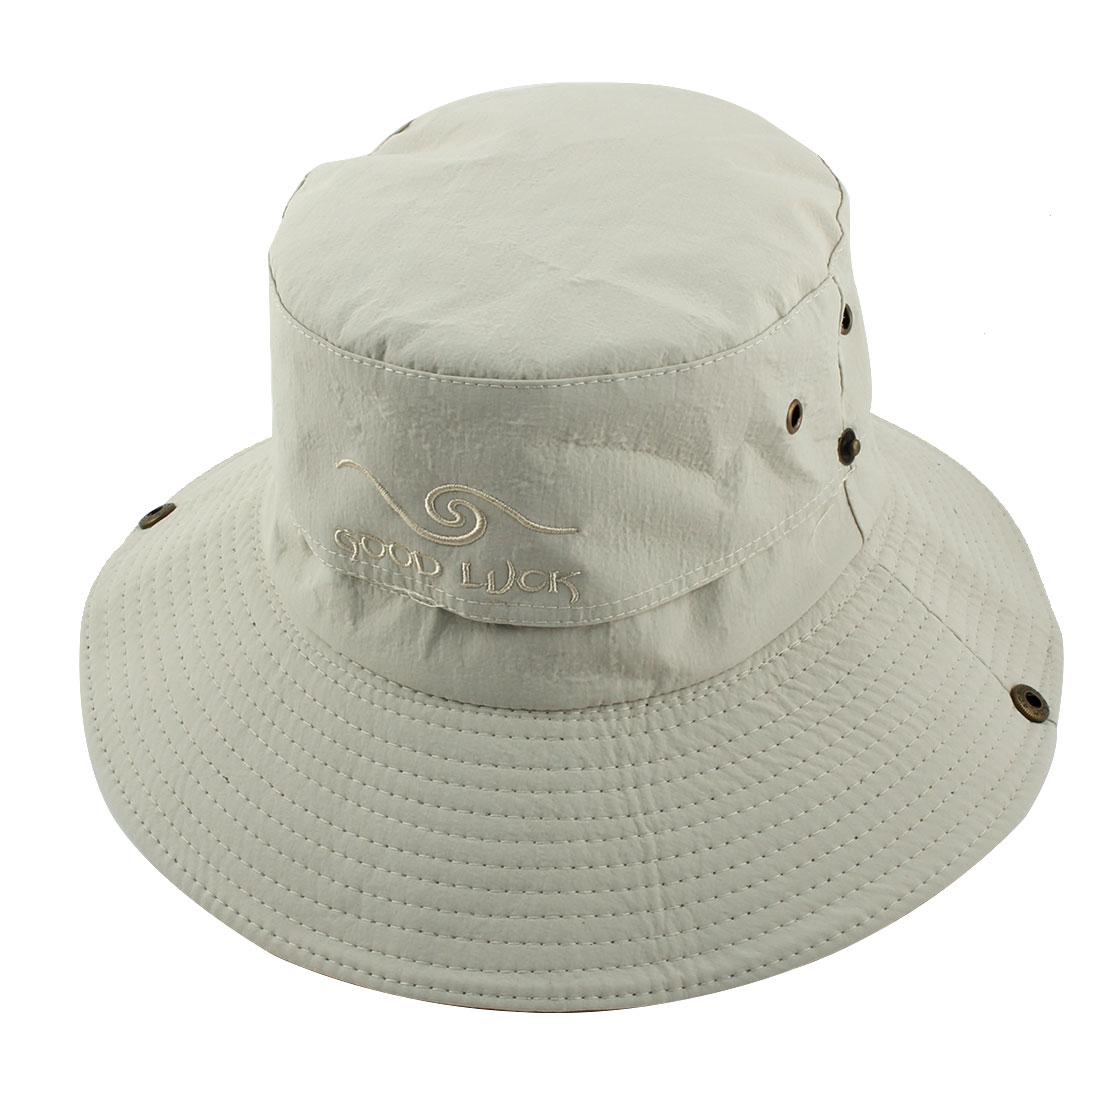 Fisherman Outdoor Sports Hiking Adjustable Strap Mesh Wide Brim Protector Bucket Summer Cap Fishing Hat Beige